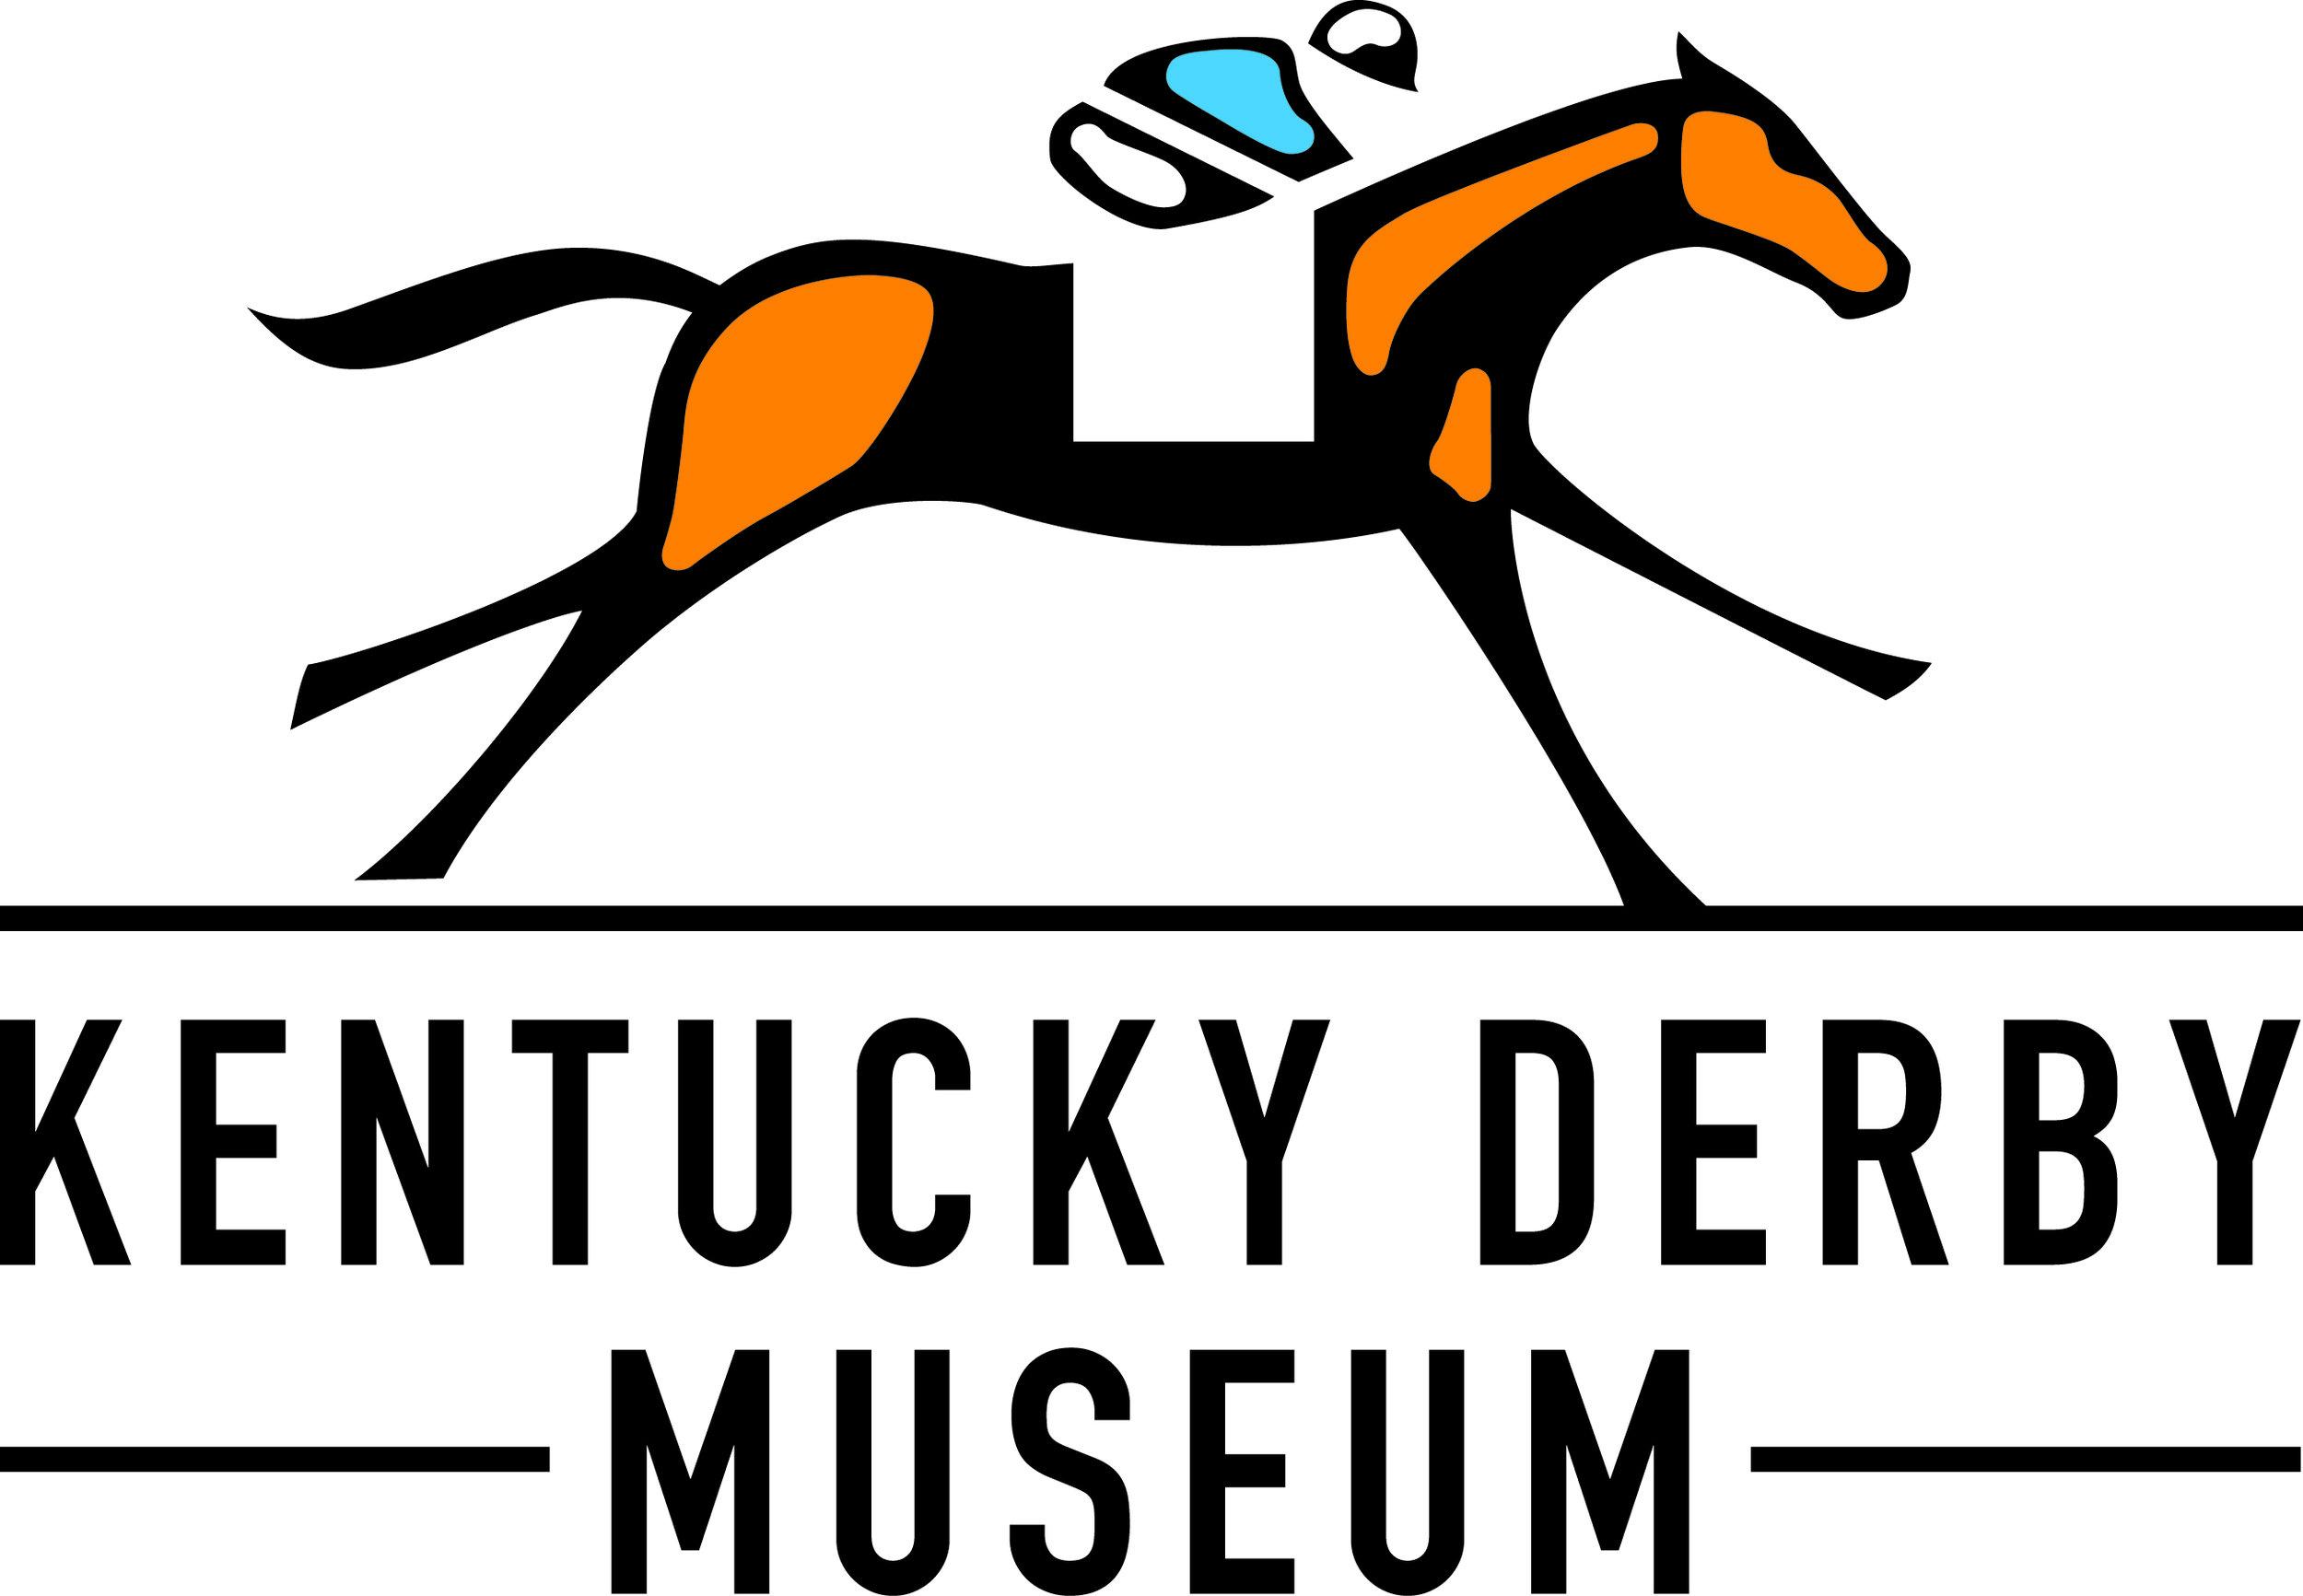 Derbymuseum.jpg